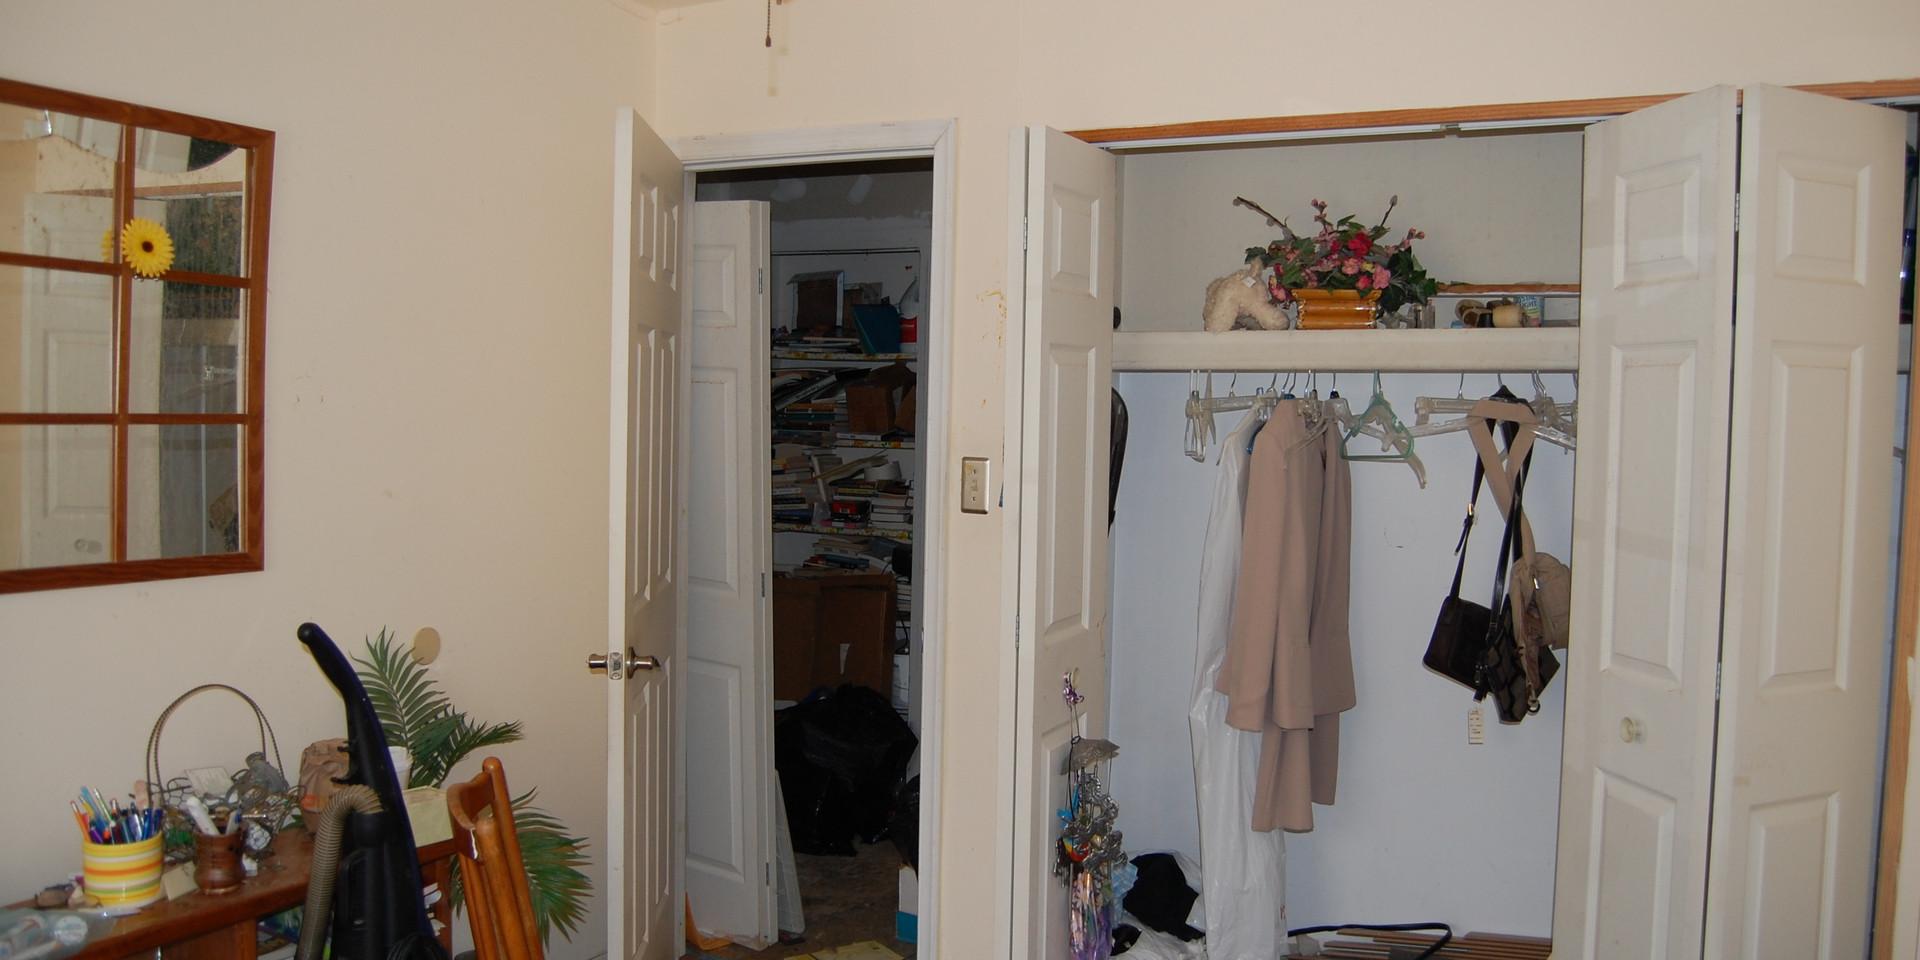 6.3 Bedroom.JPG